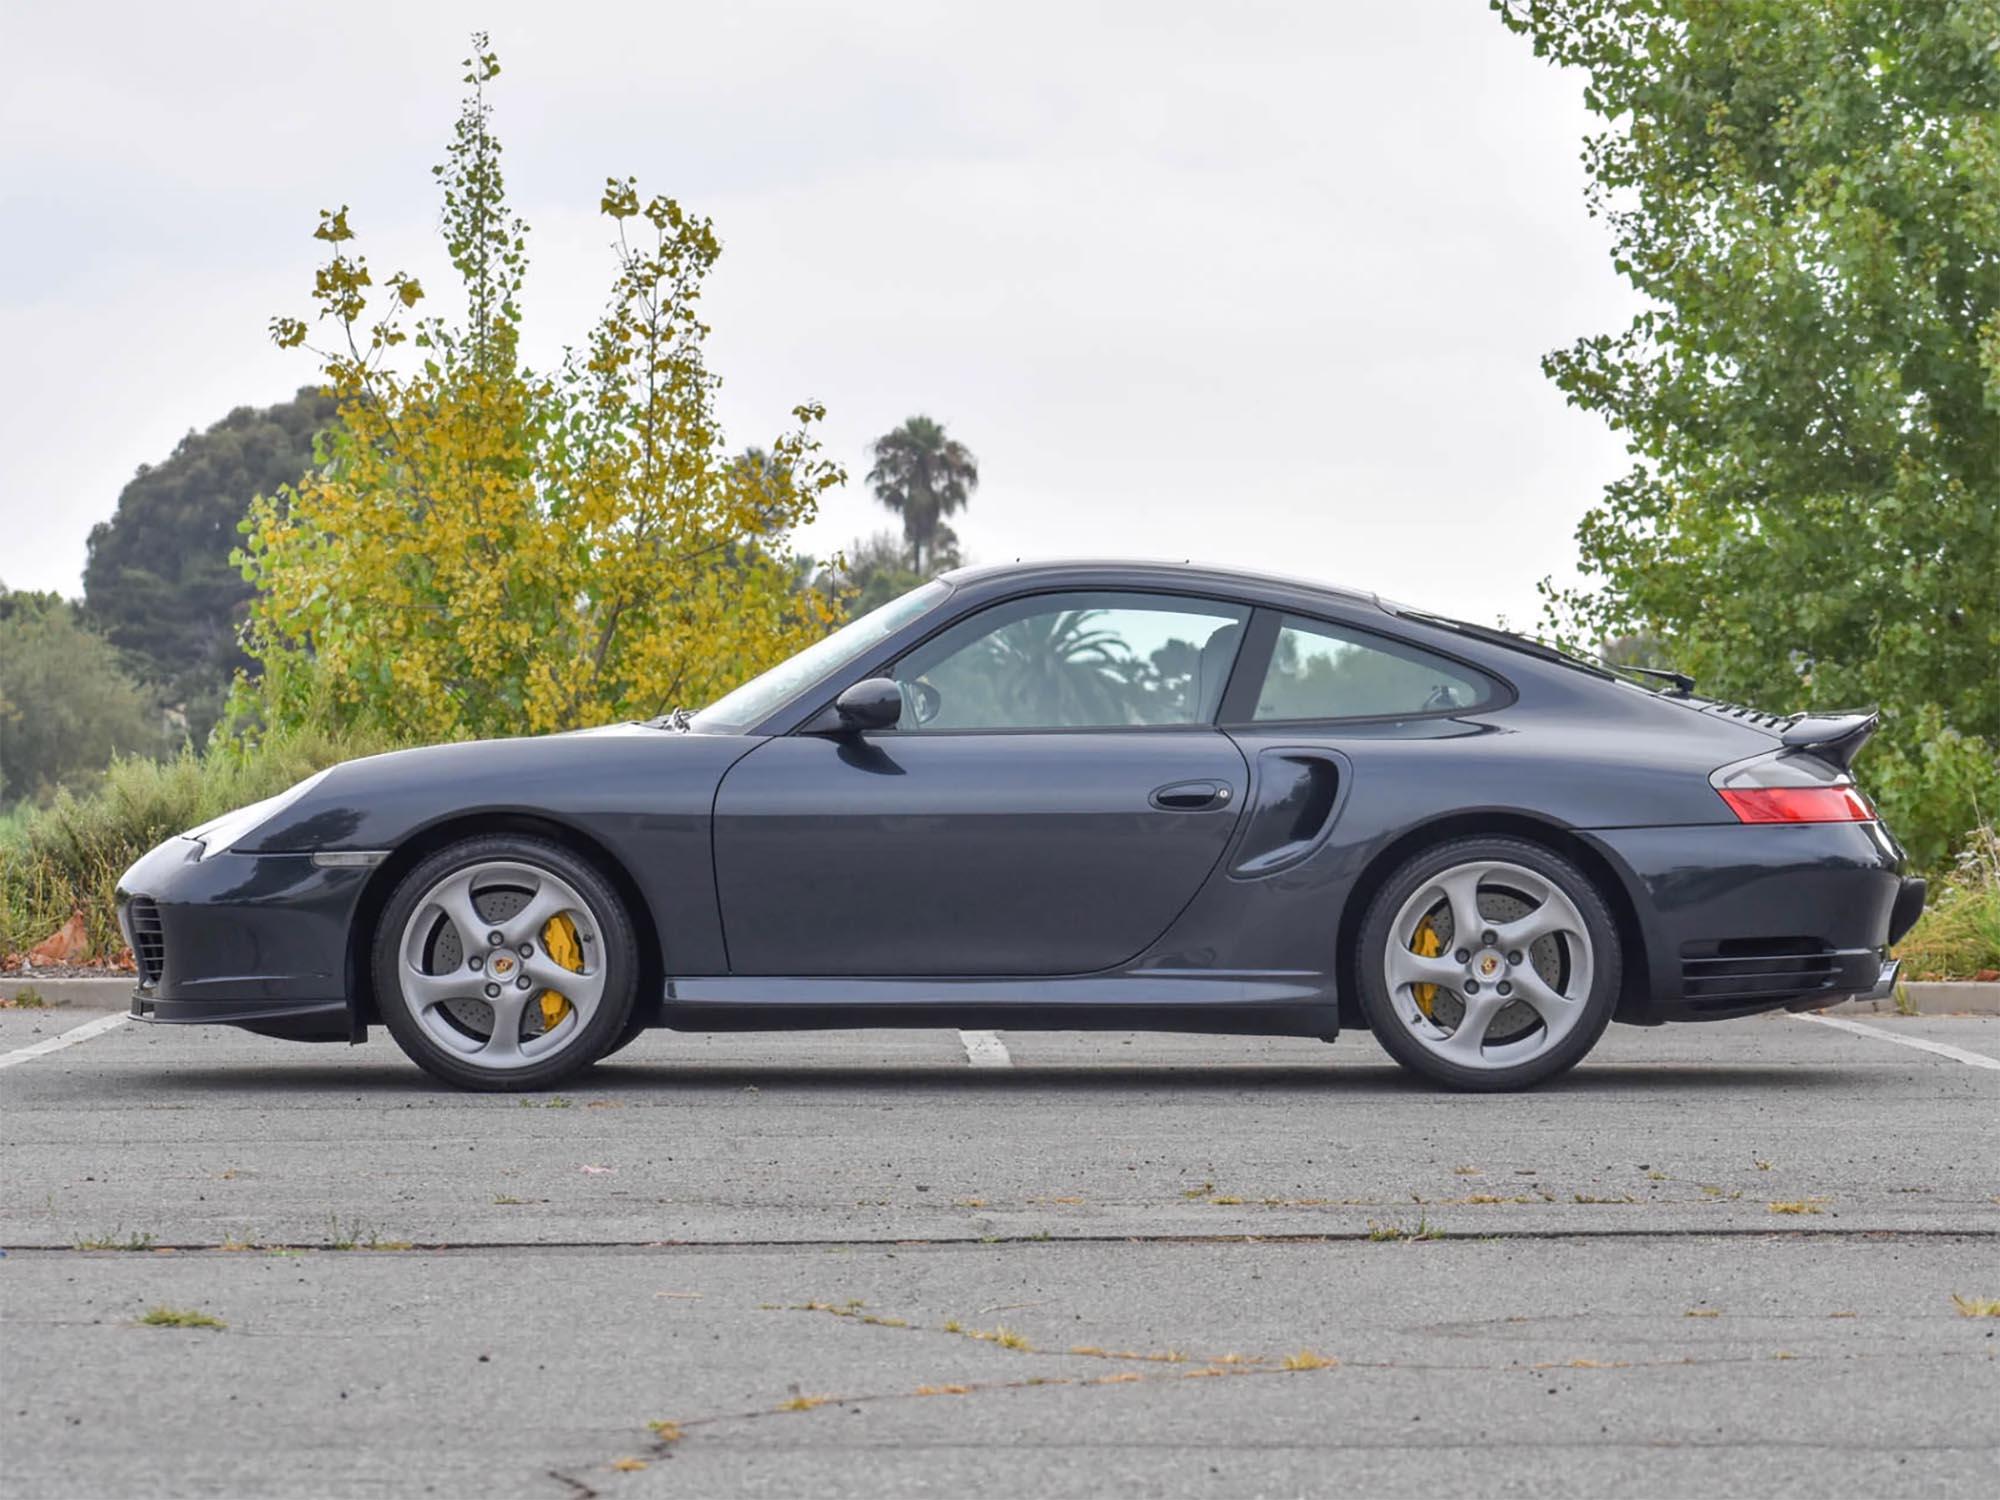 2005 Porsche 911 Turbo S Coupe